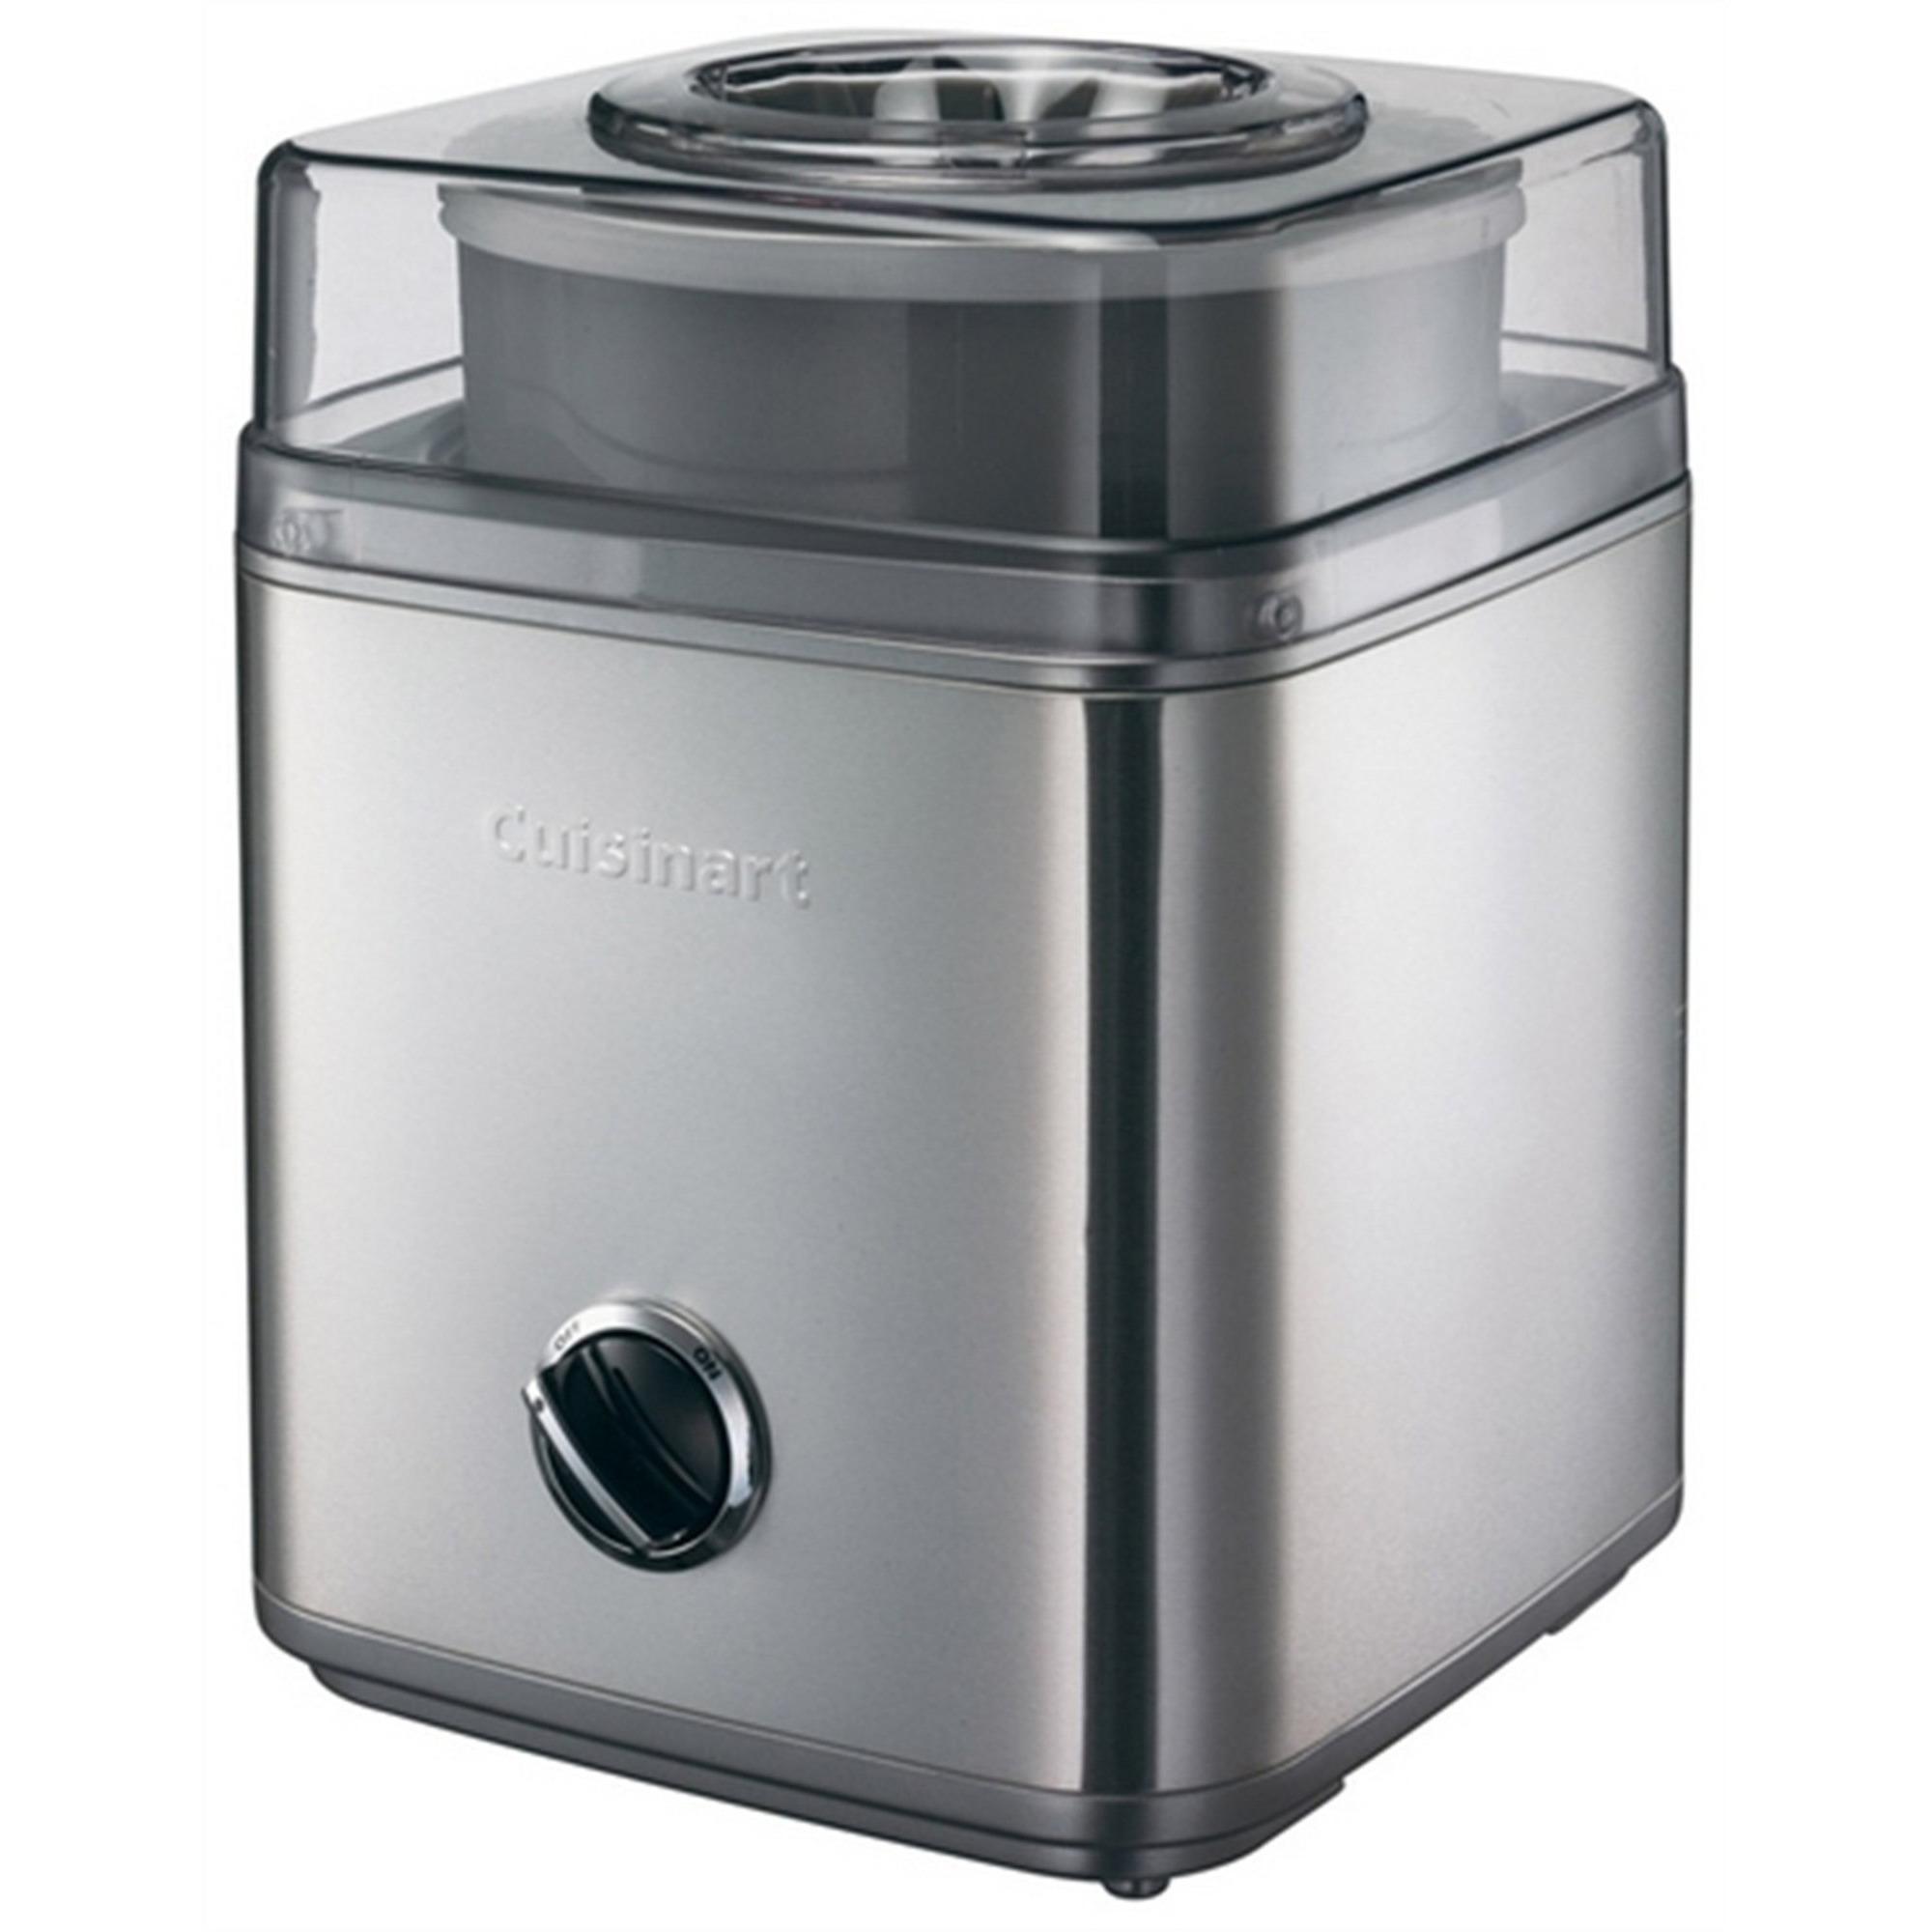 Cuisinart Glassmaskin ICE-30 – 1.5L